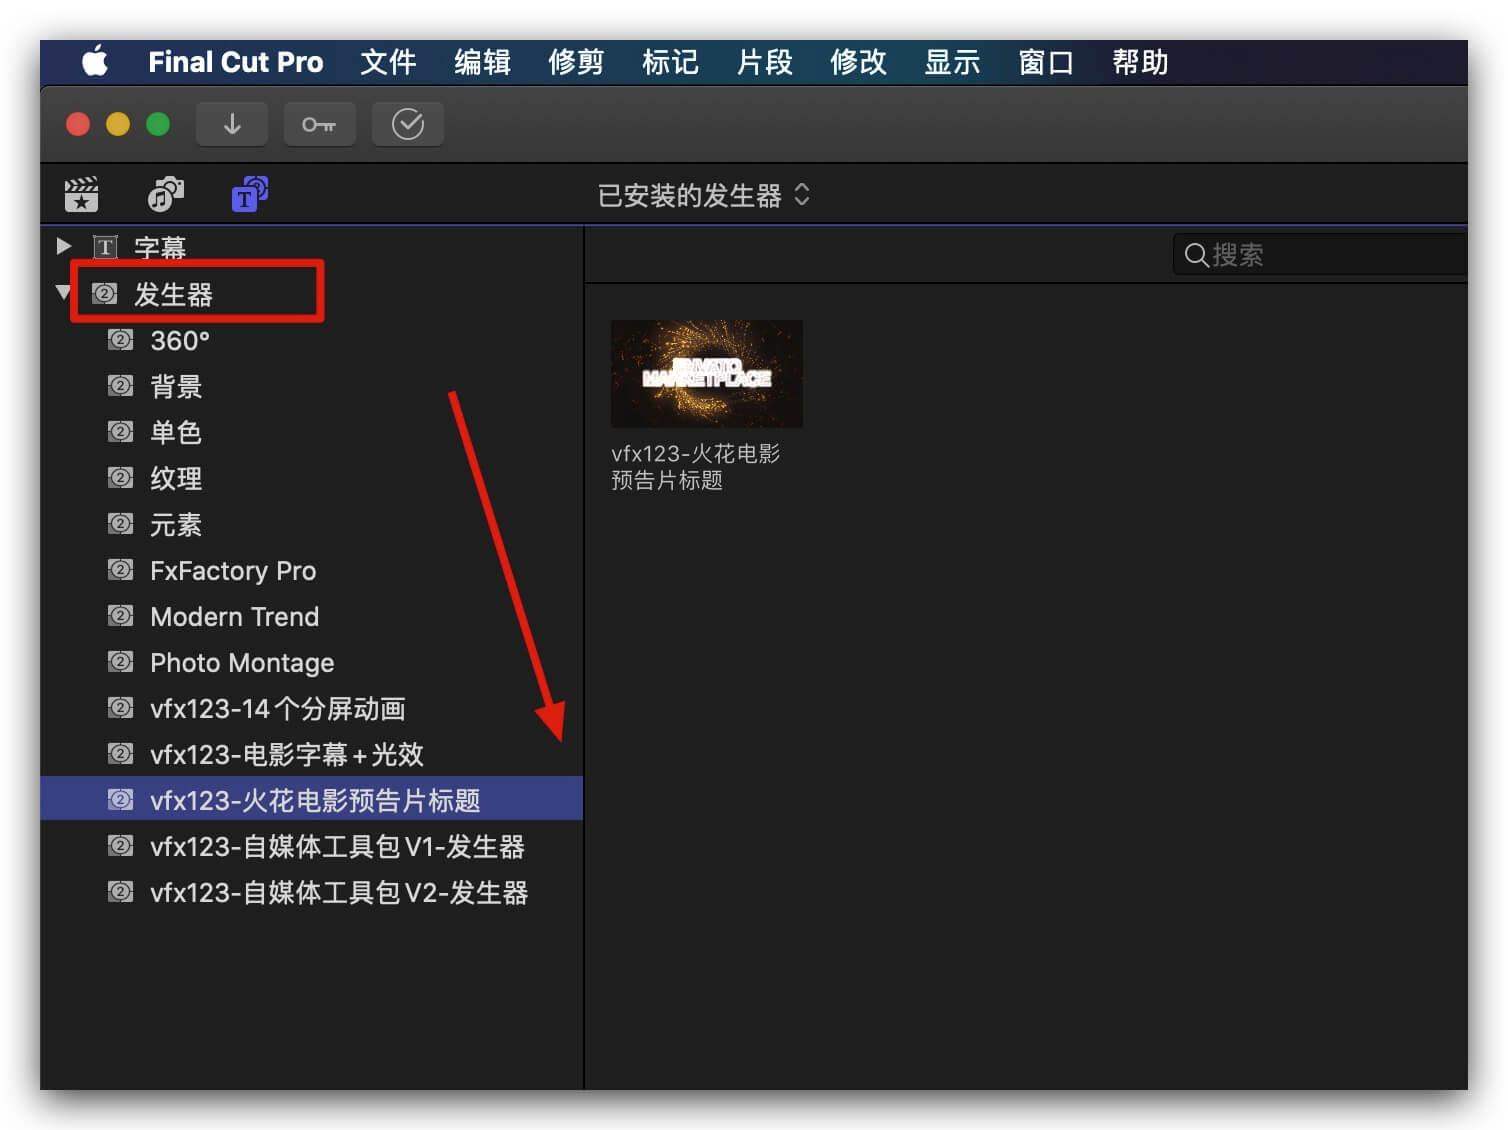 fcpx插件 大气震撼粒子火花特效电影预告片模板 Cinematic Trailer Titles